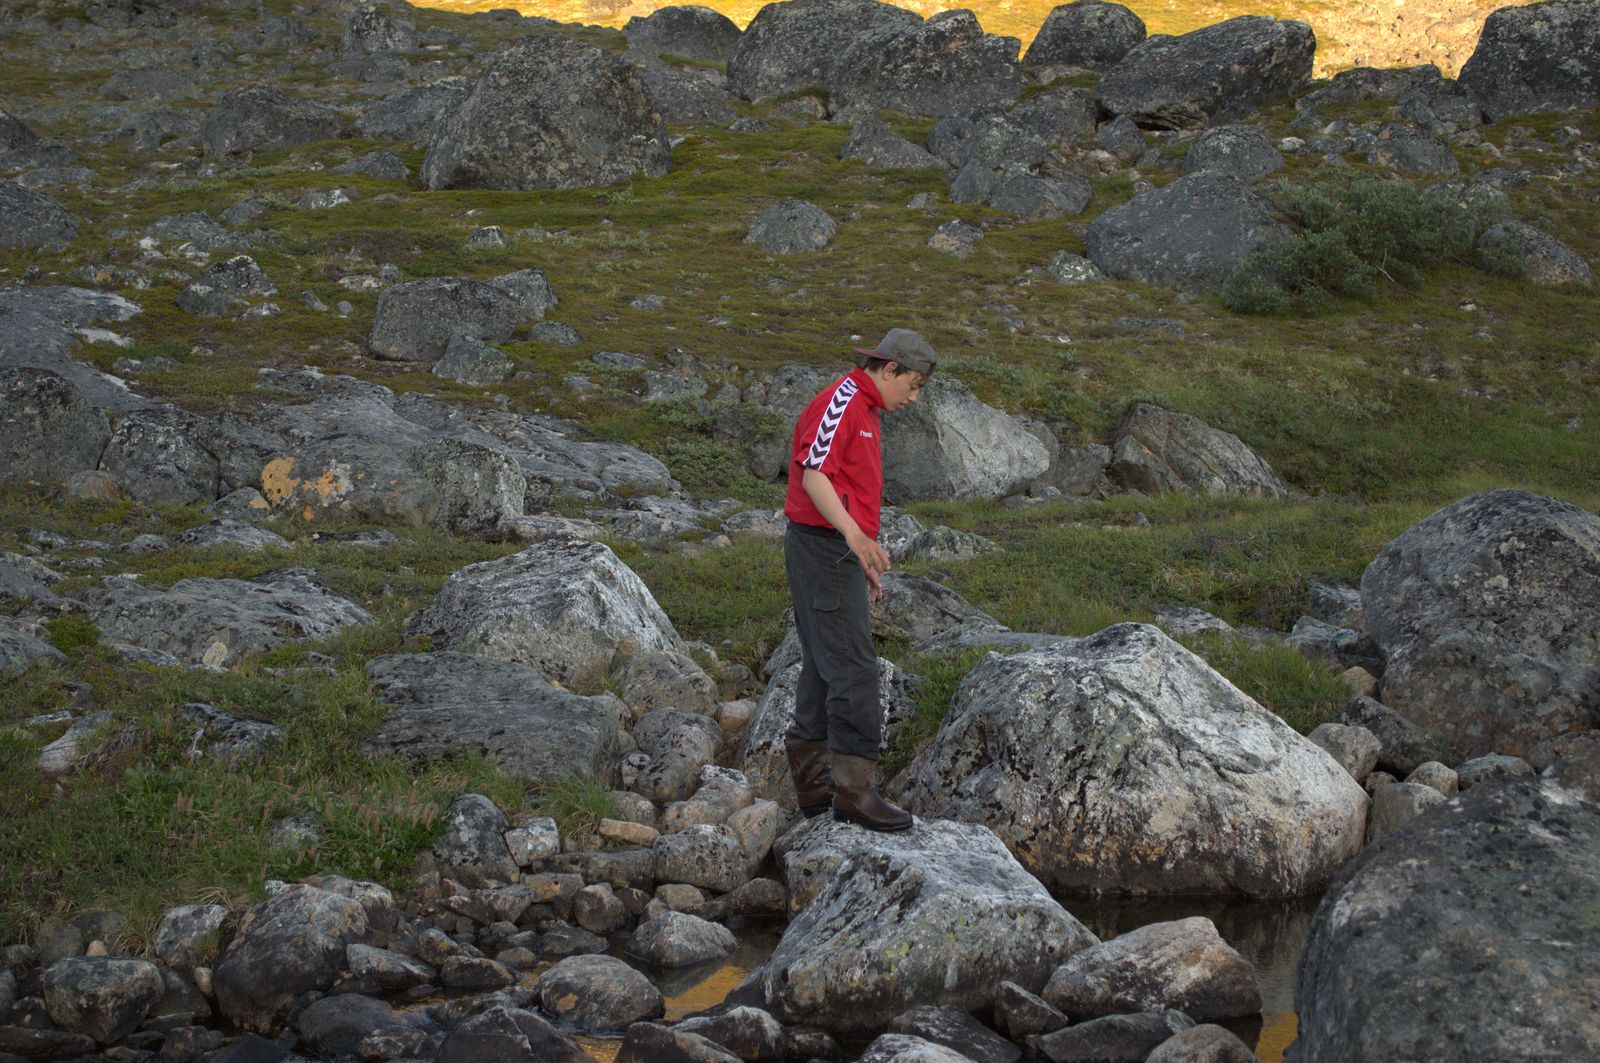 2014-07-24-2116_-_Anders-Martinsen